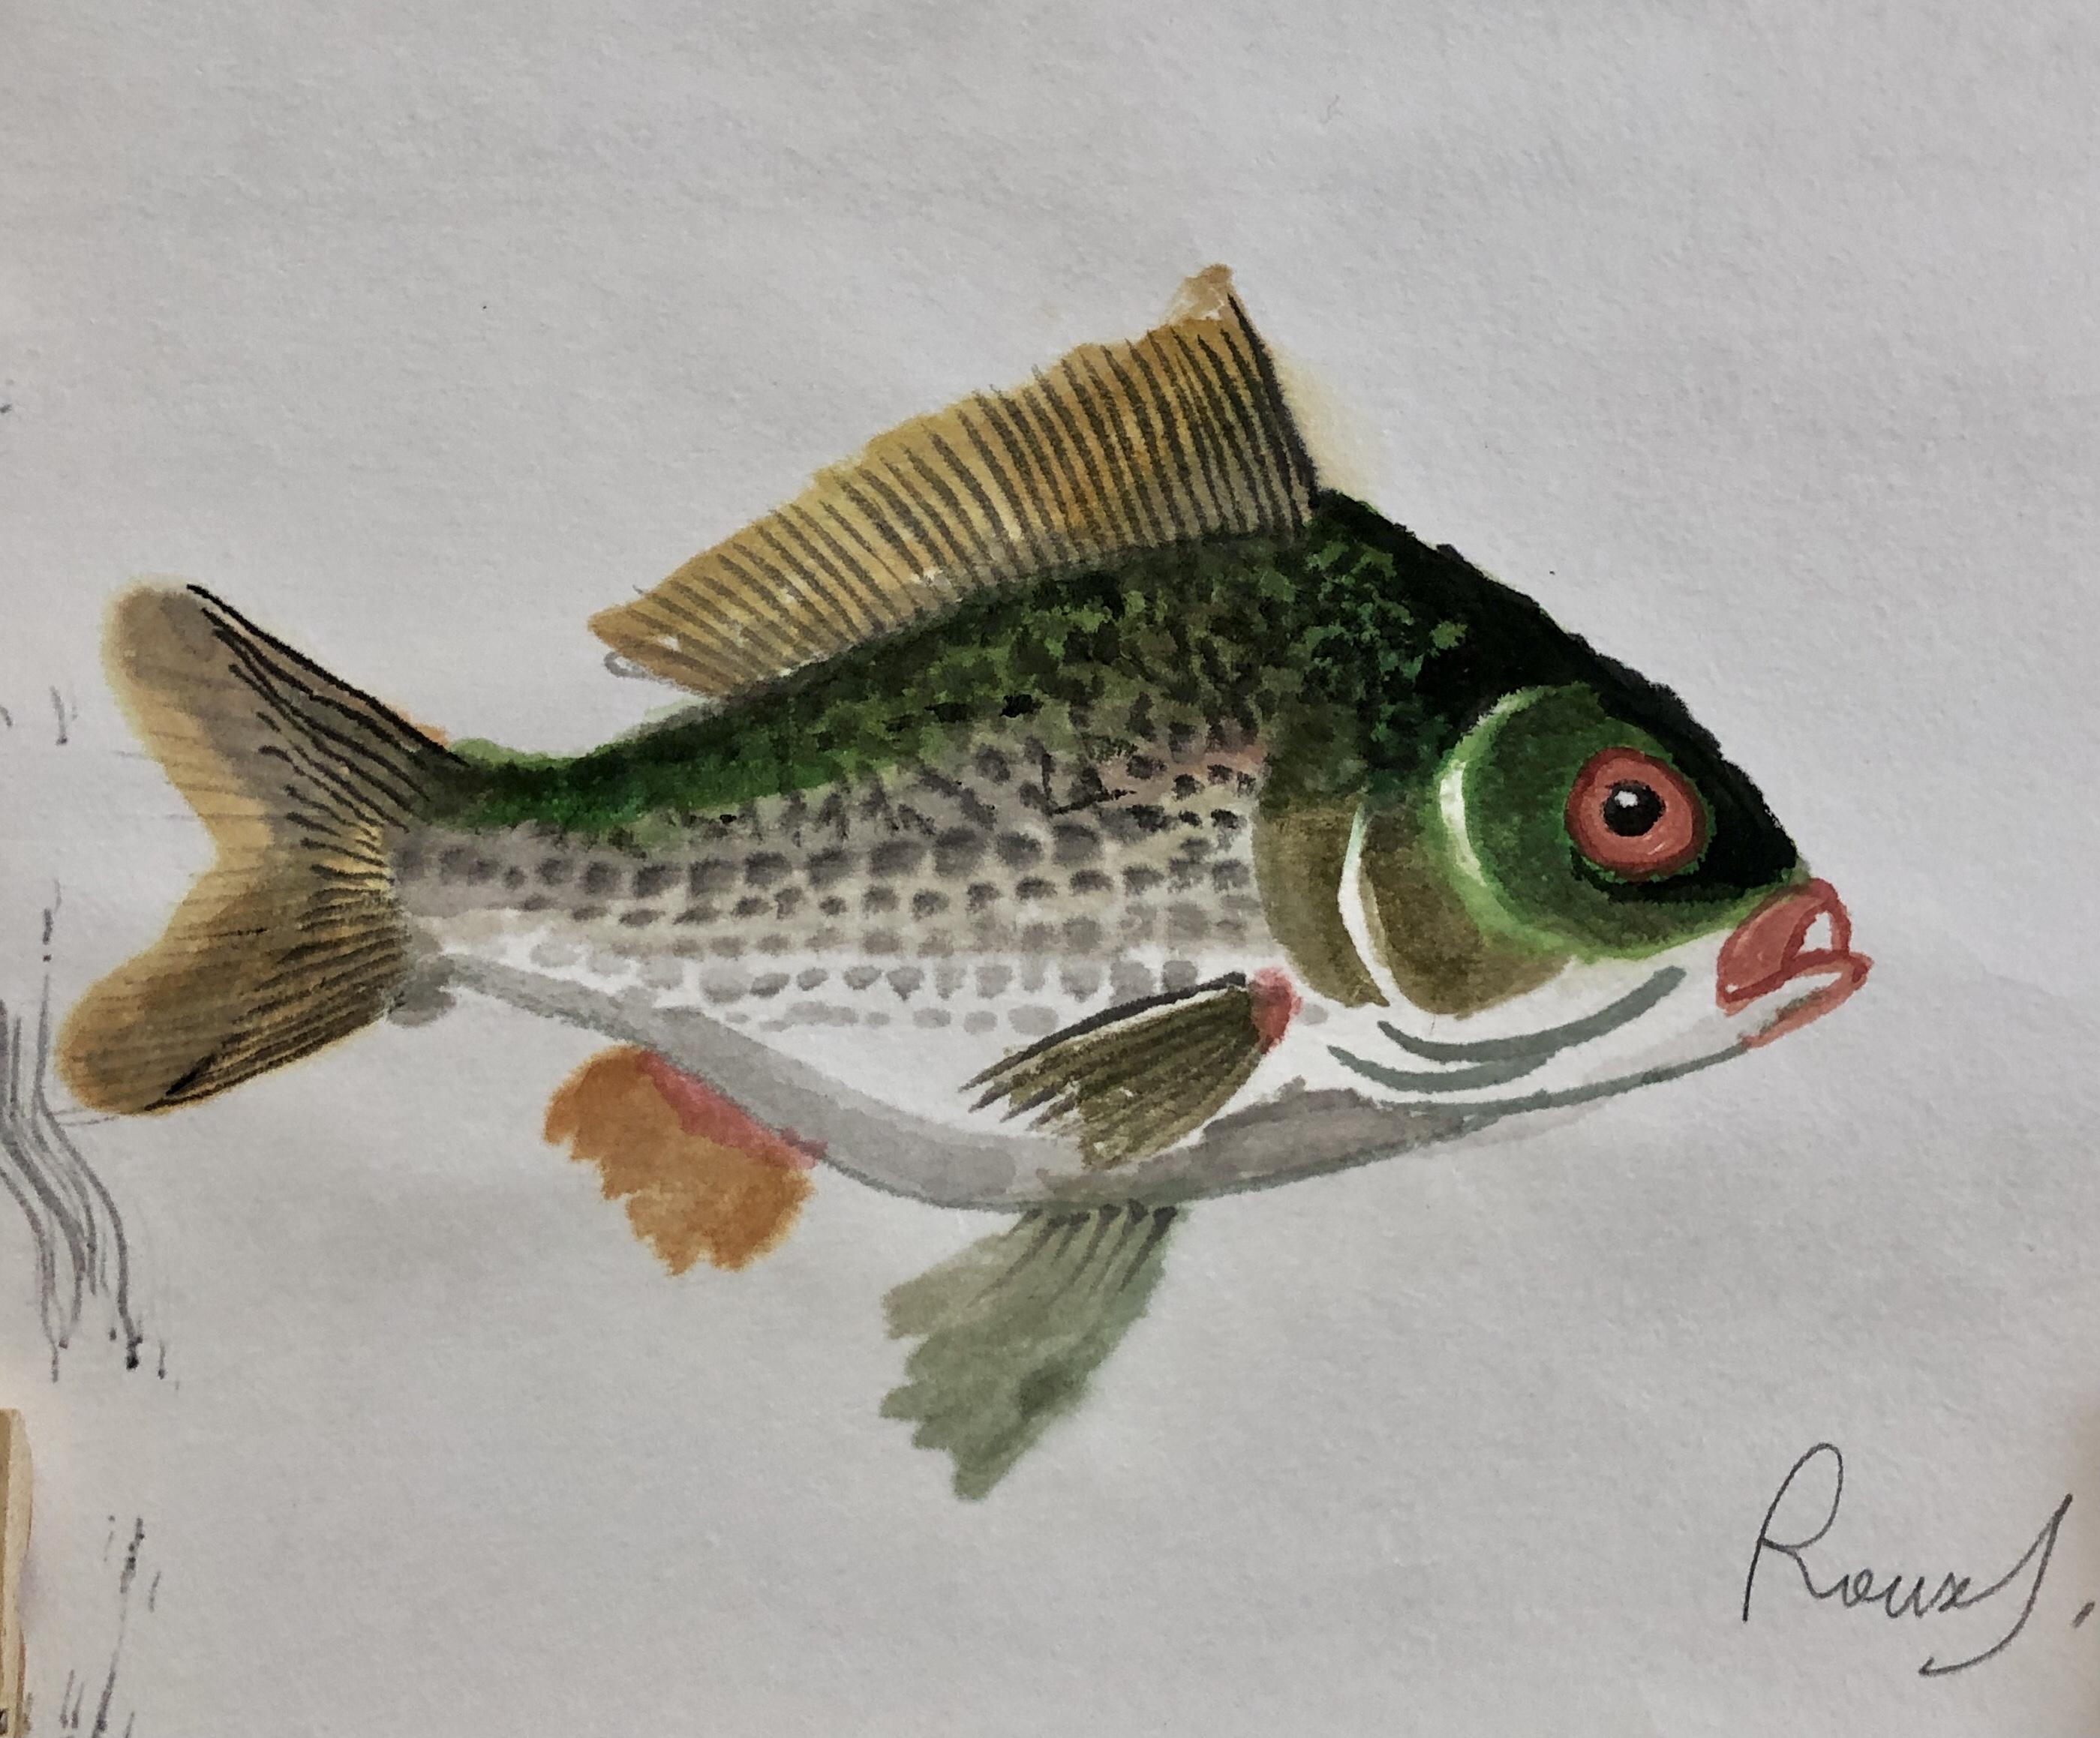 Fish 20, 2020, Tinte, Gouache, Acryl auf Japanpapier, 20 x 20 cm